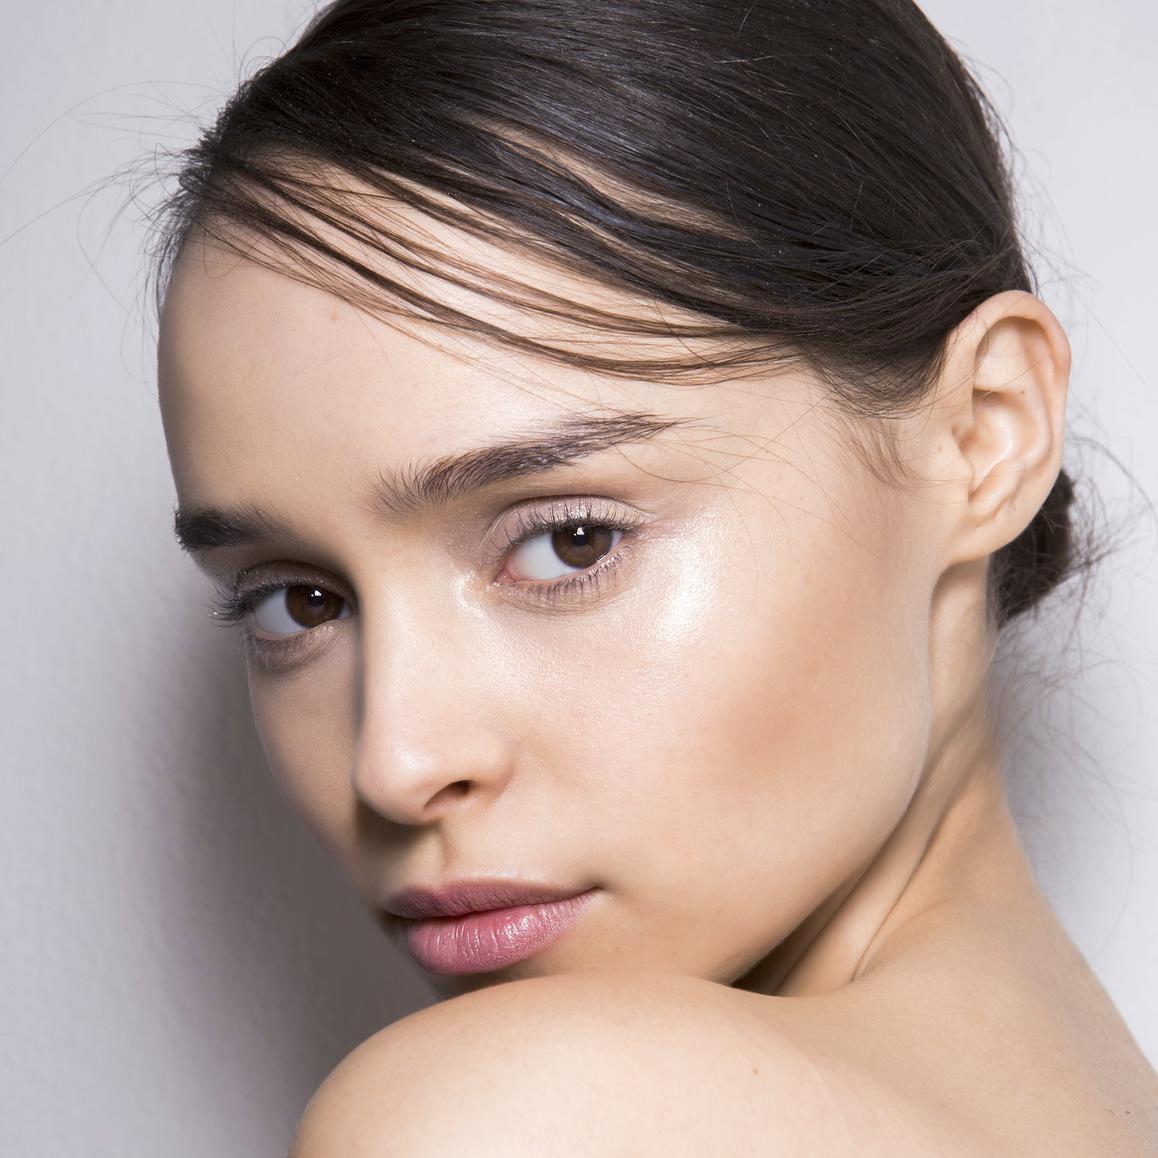 12 Easy Ways to Get Gorgeous Skin Overnight